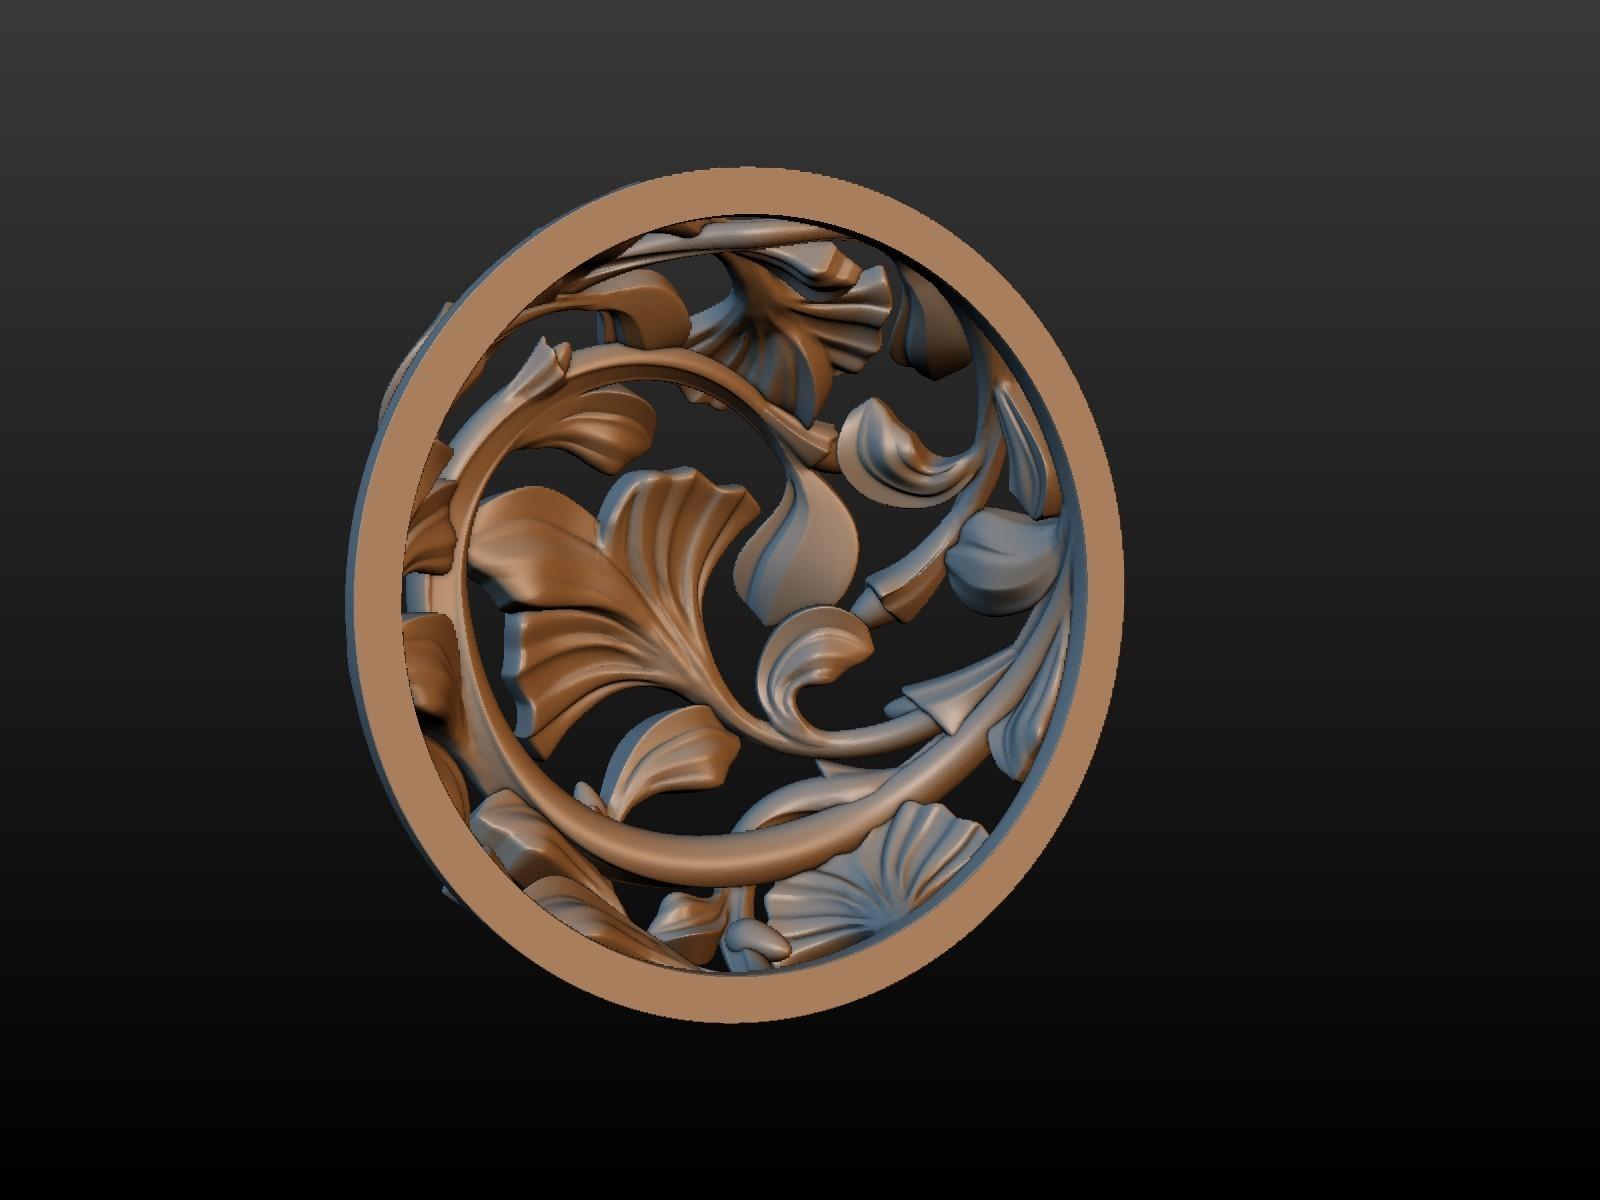 Earring-06.jpg Download STL file Earring • 3D printing template, Skazok